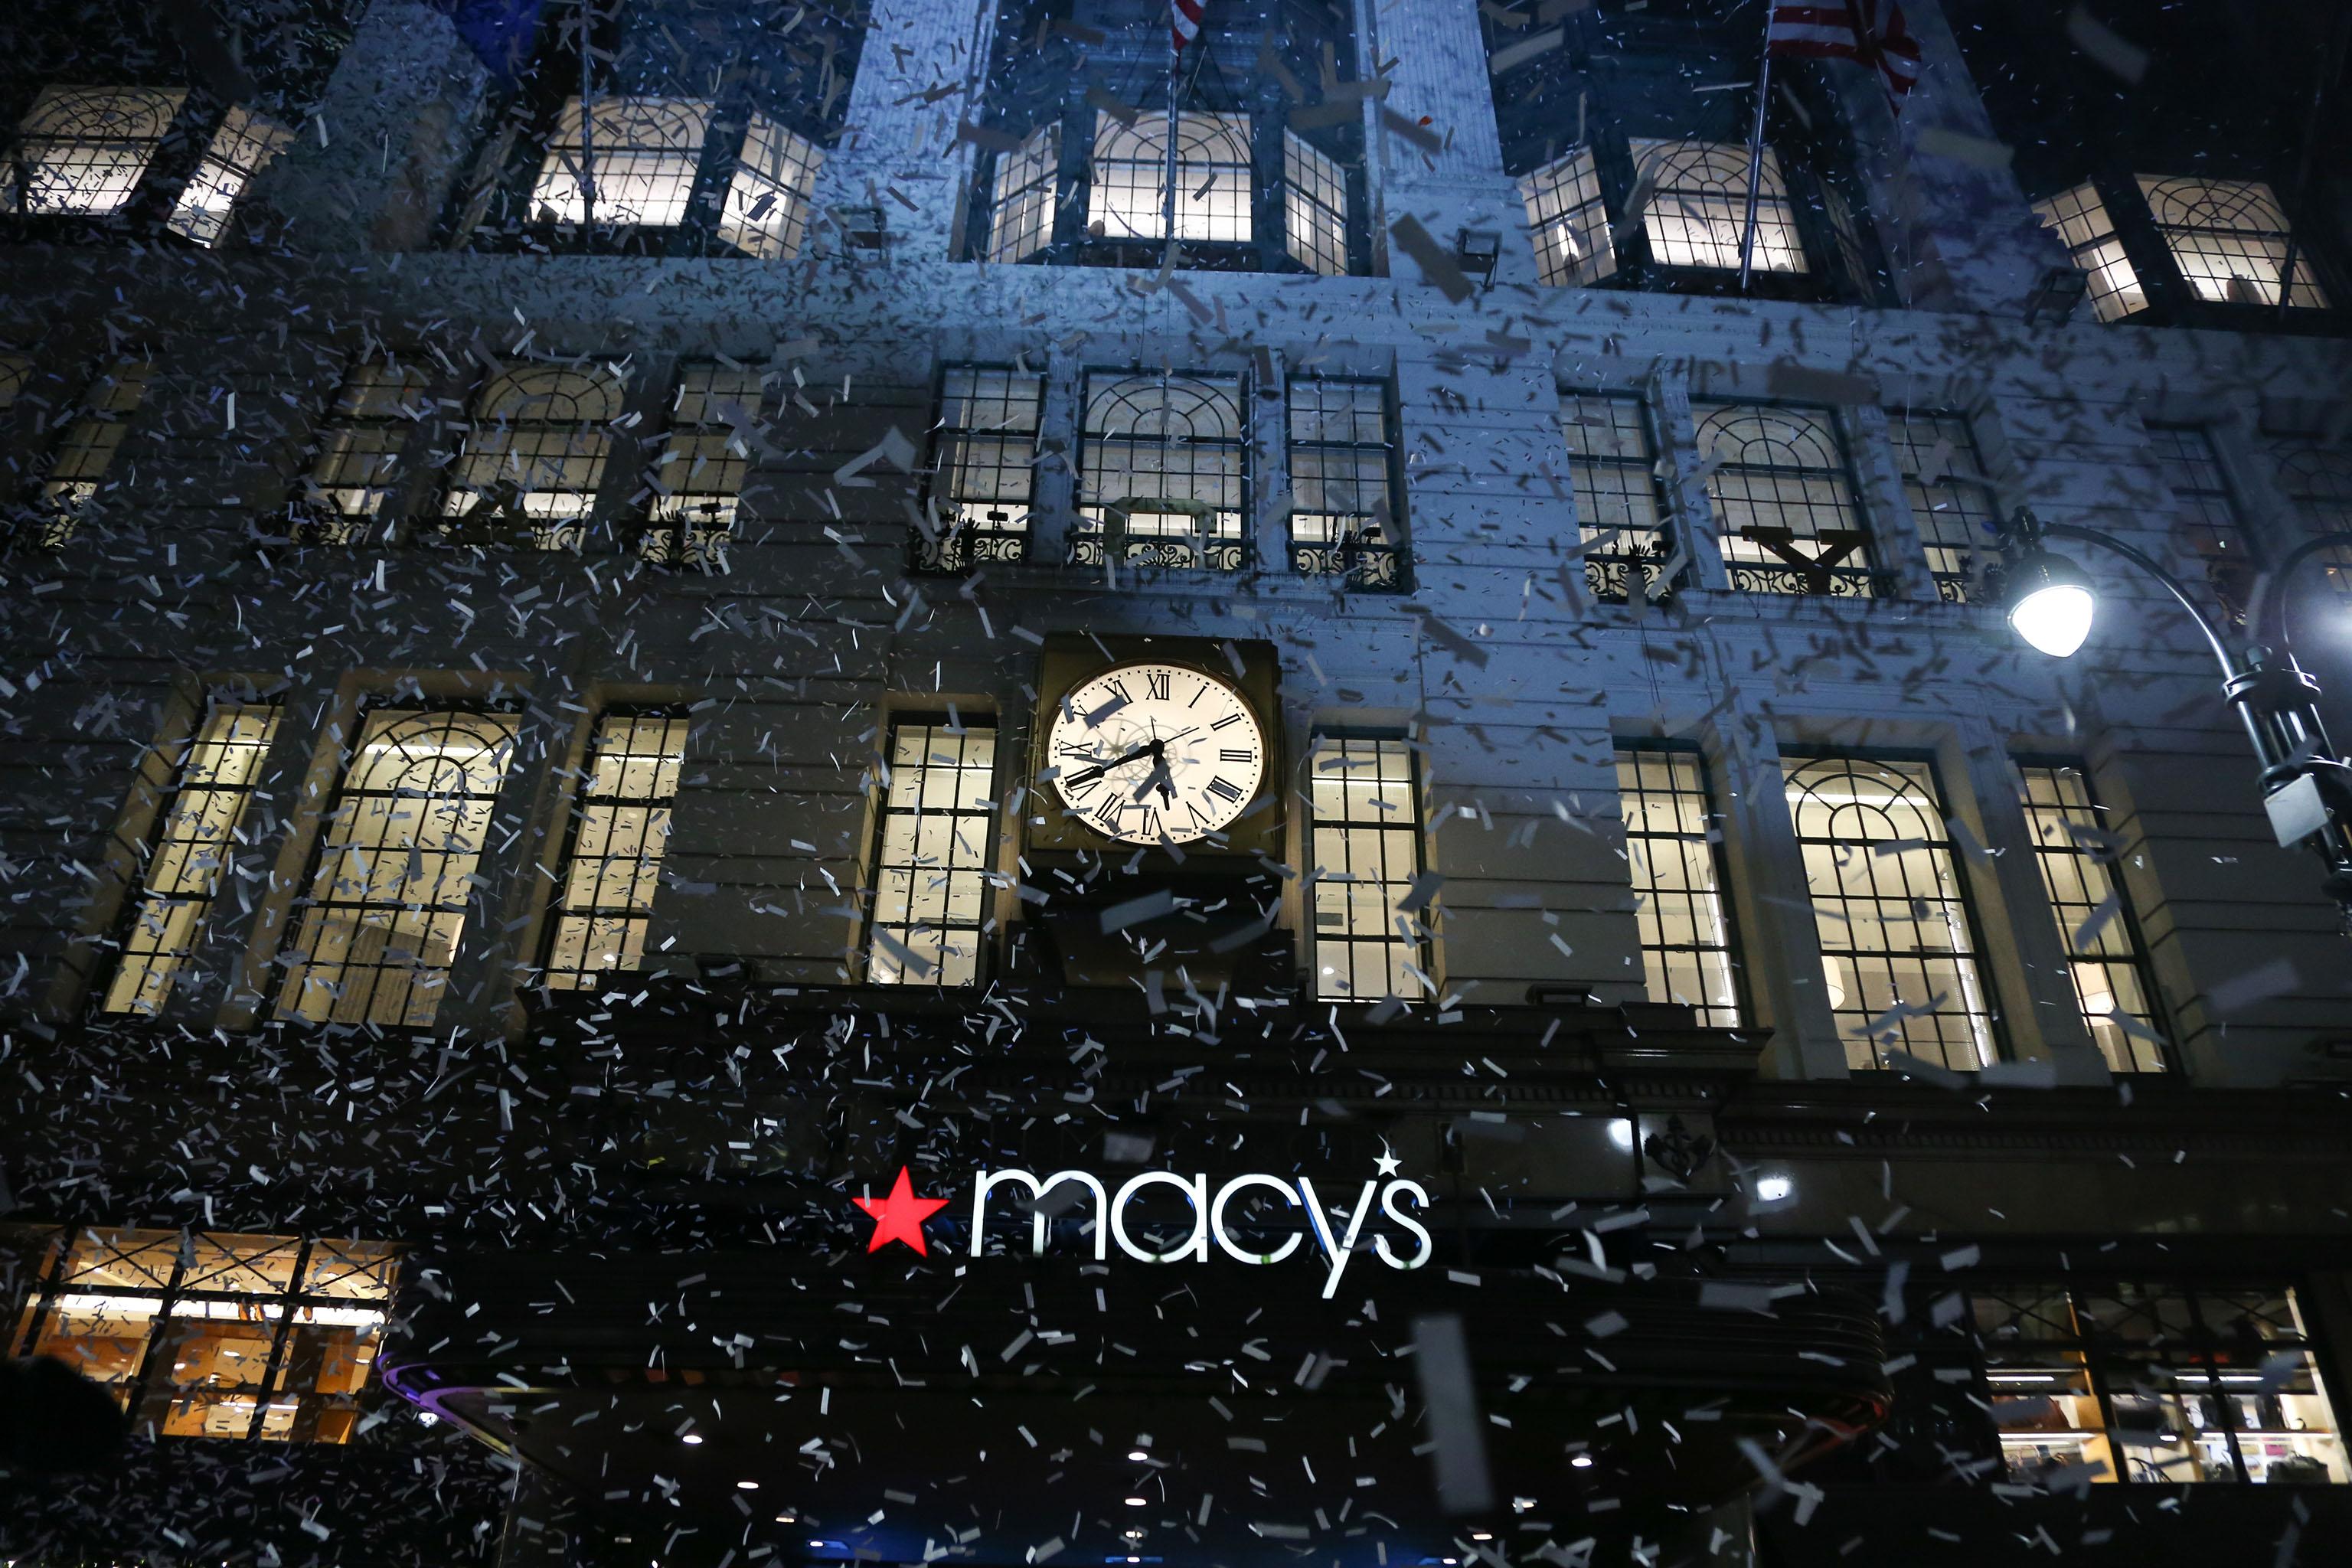 Macy's unveils Christmas windows that celebrate New York City.